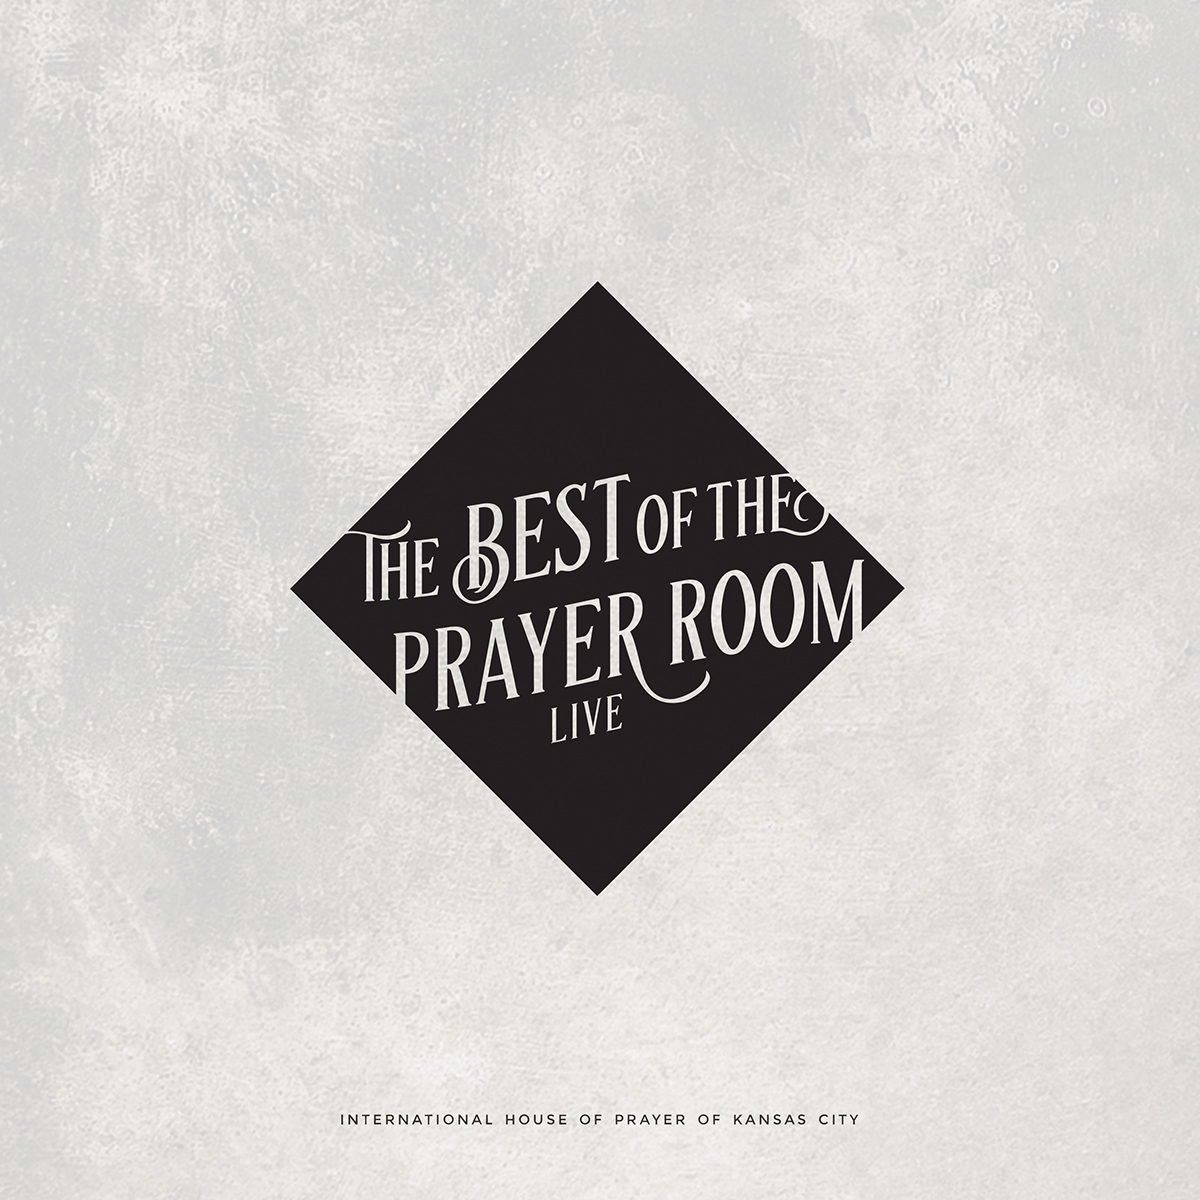 Beautiful Ihop Live Stream Prayer Room Image - Living Room Design ...